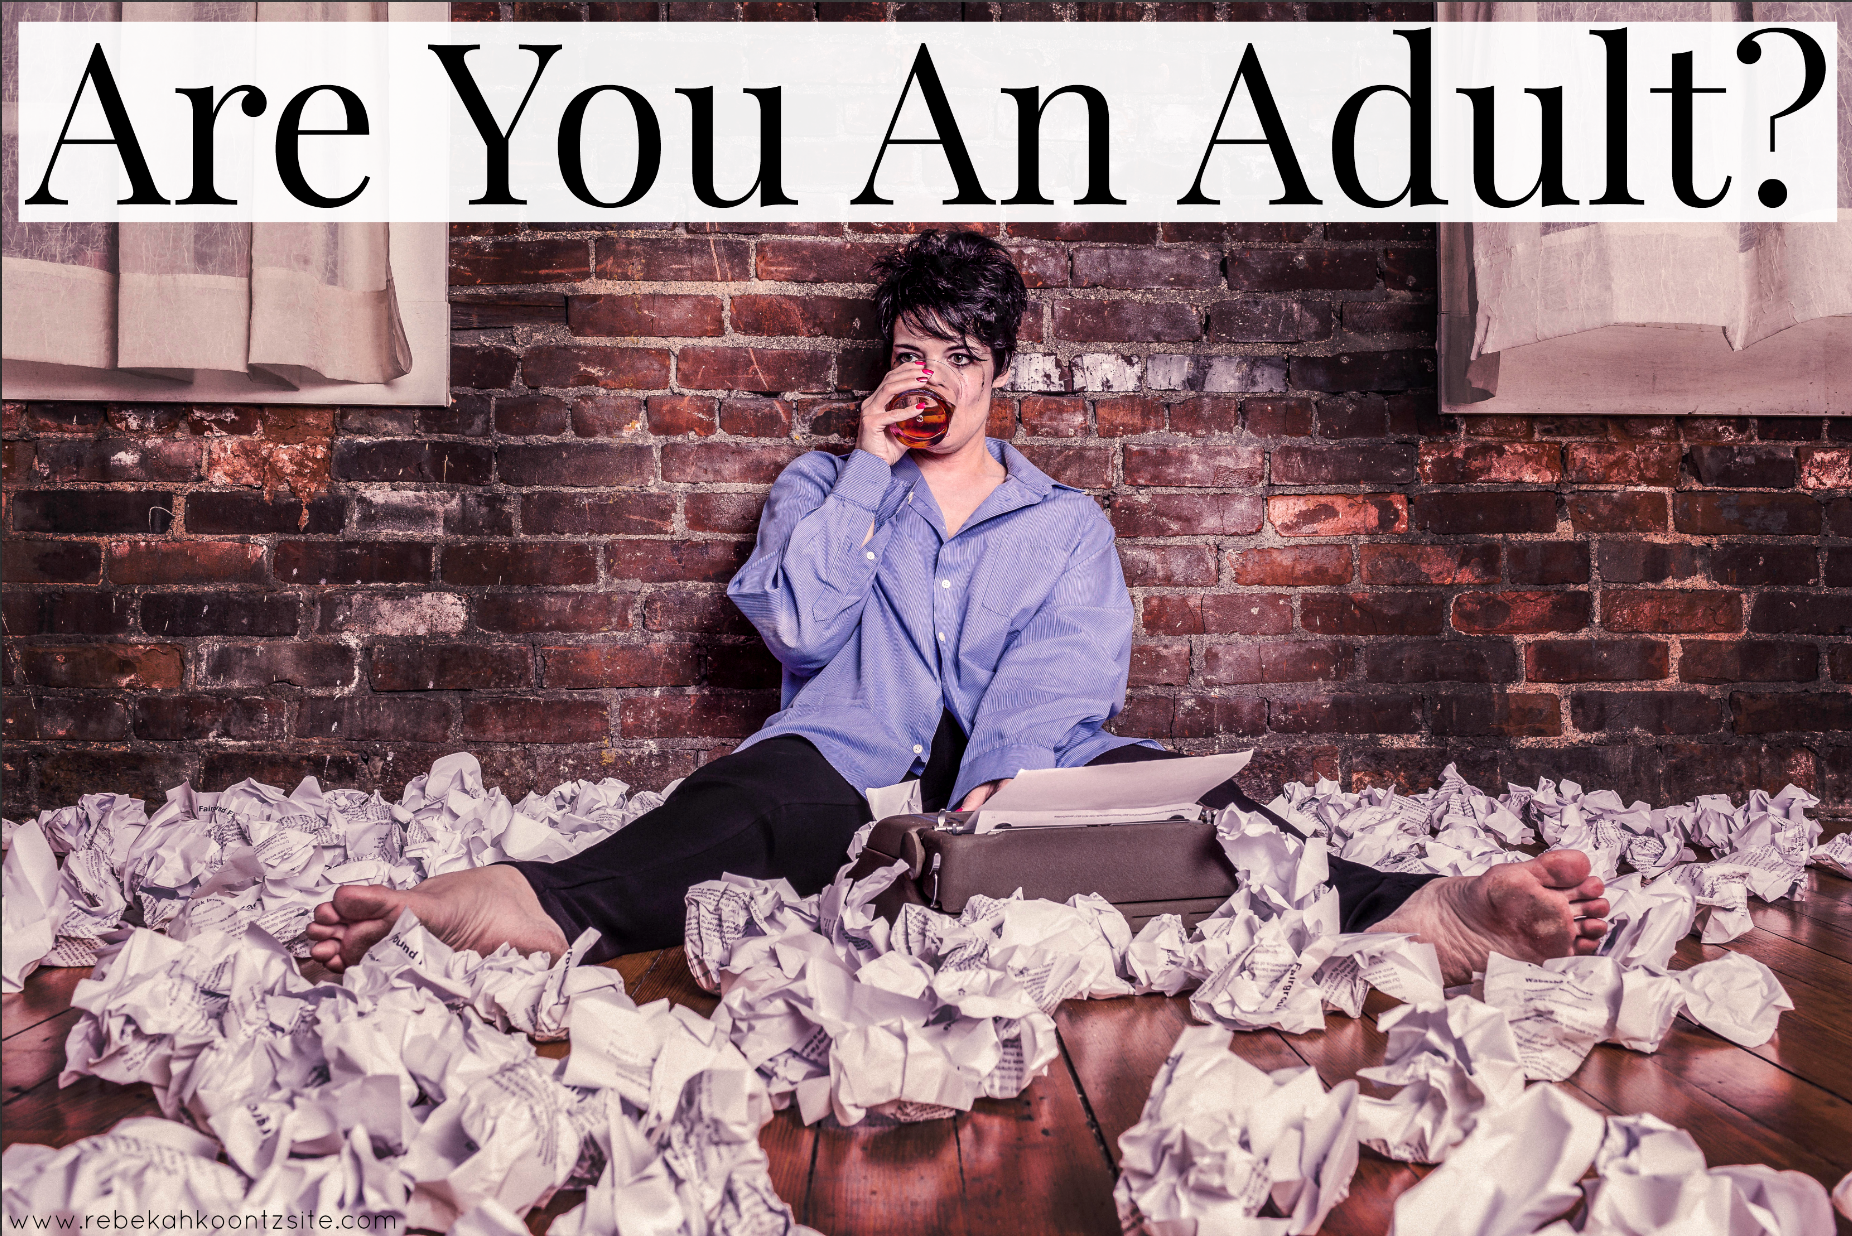 ARE YOU AN ADULT FUNNY JOKE HUMOR ADULTHOOD LIFE GROWING UP